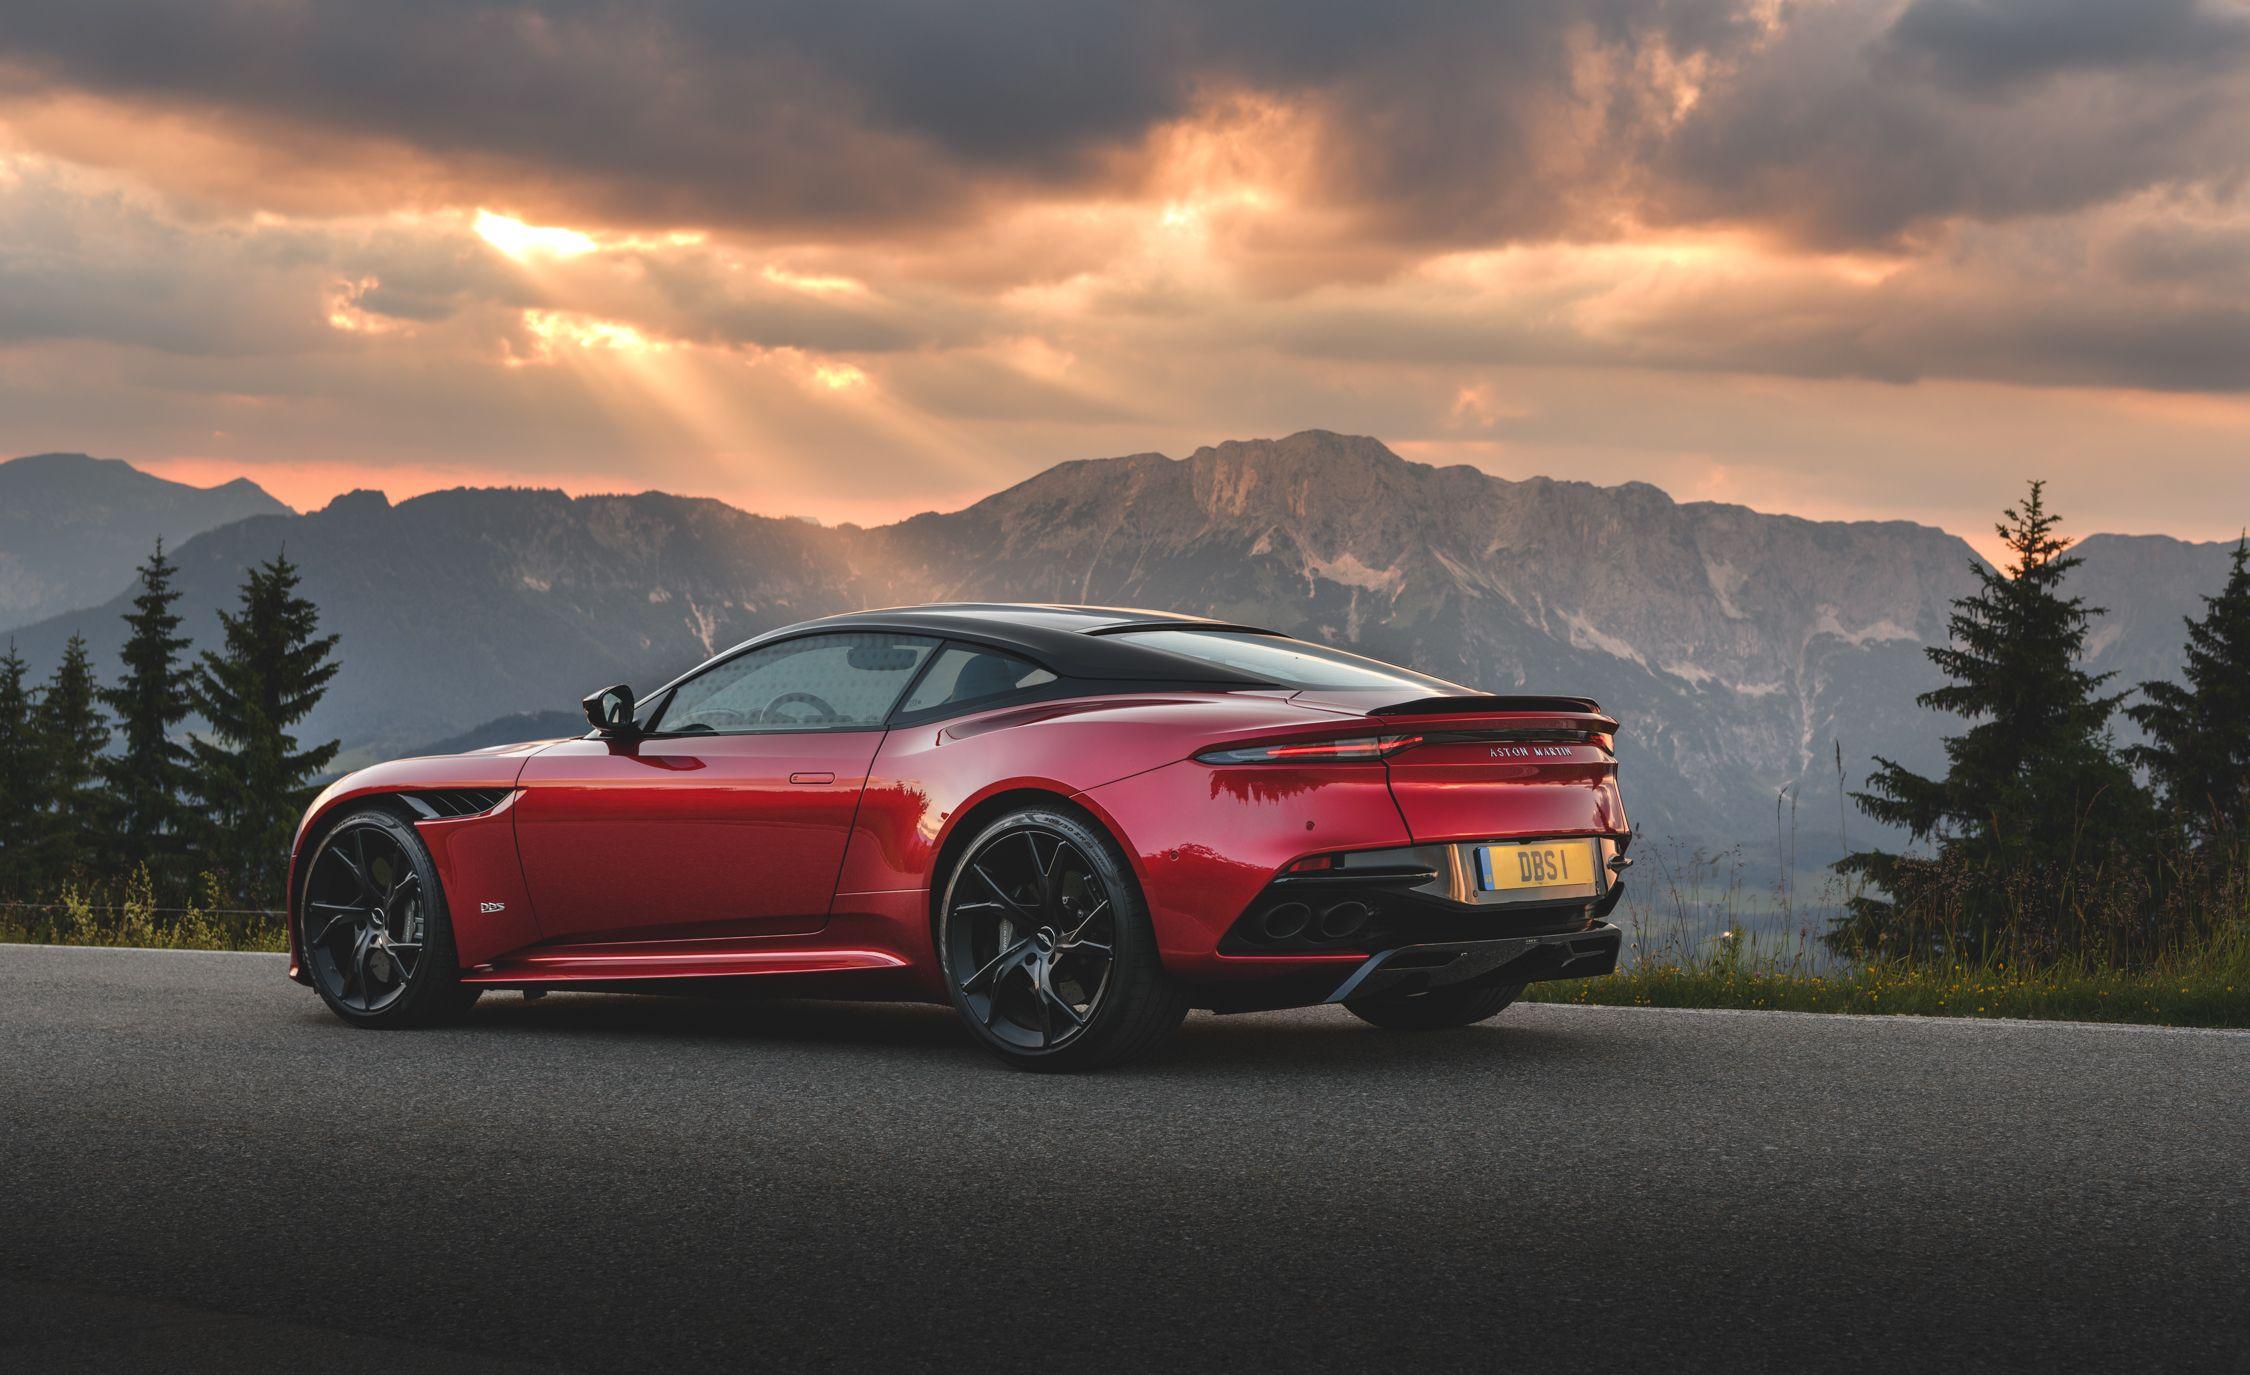 Aston Martin DBS Superleggera Reviews Aston Martin DBS - Aston martin db